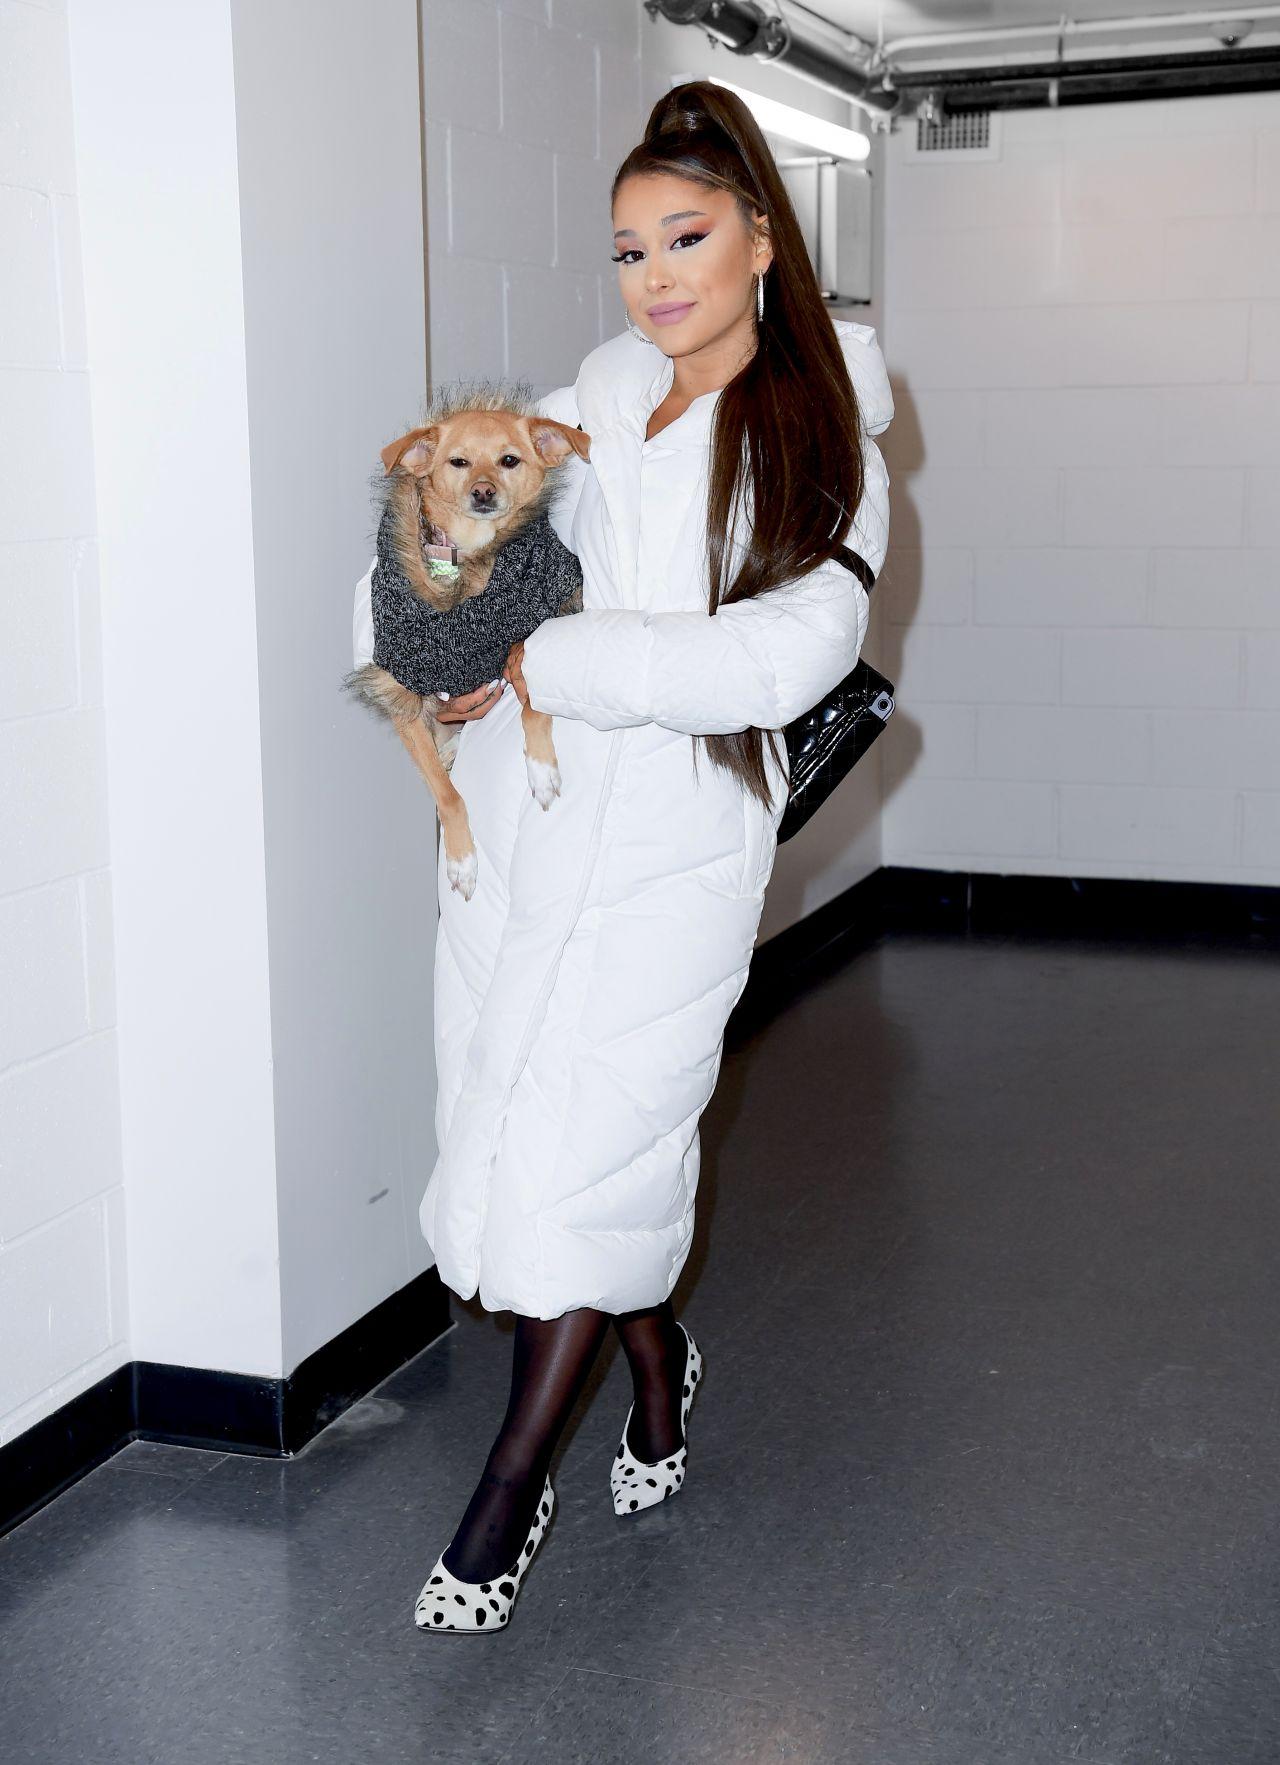 Ariana Grande - Backstage at Her Sweetener World Tour ...